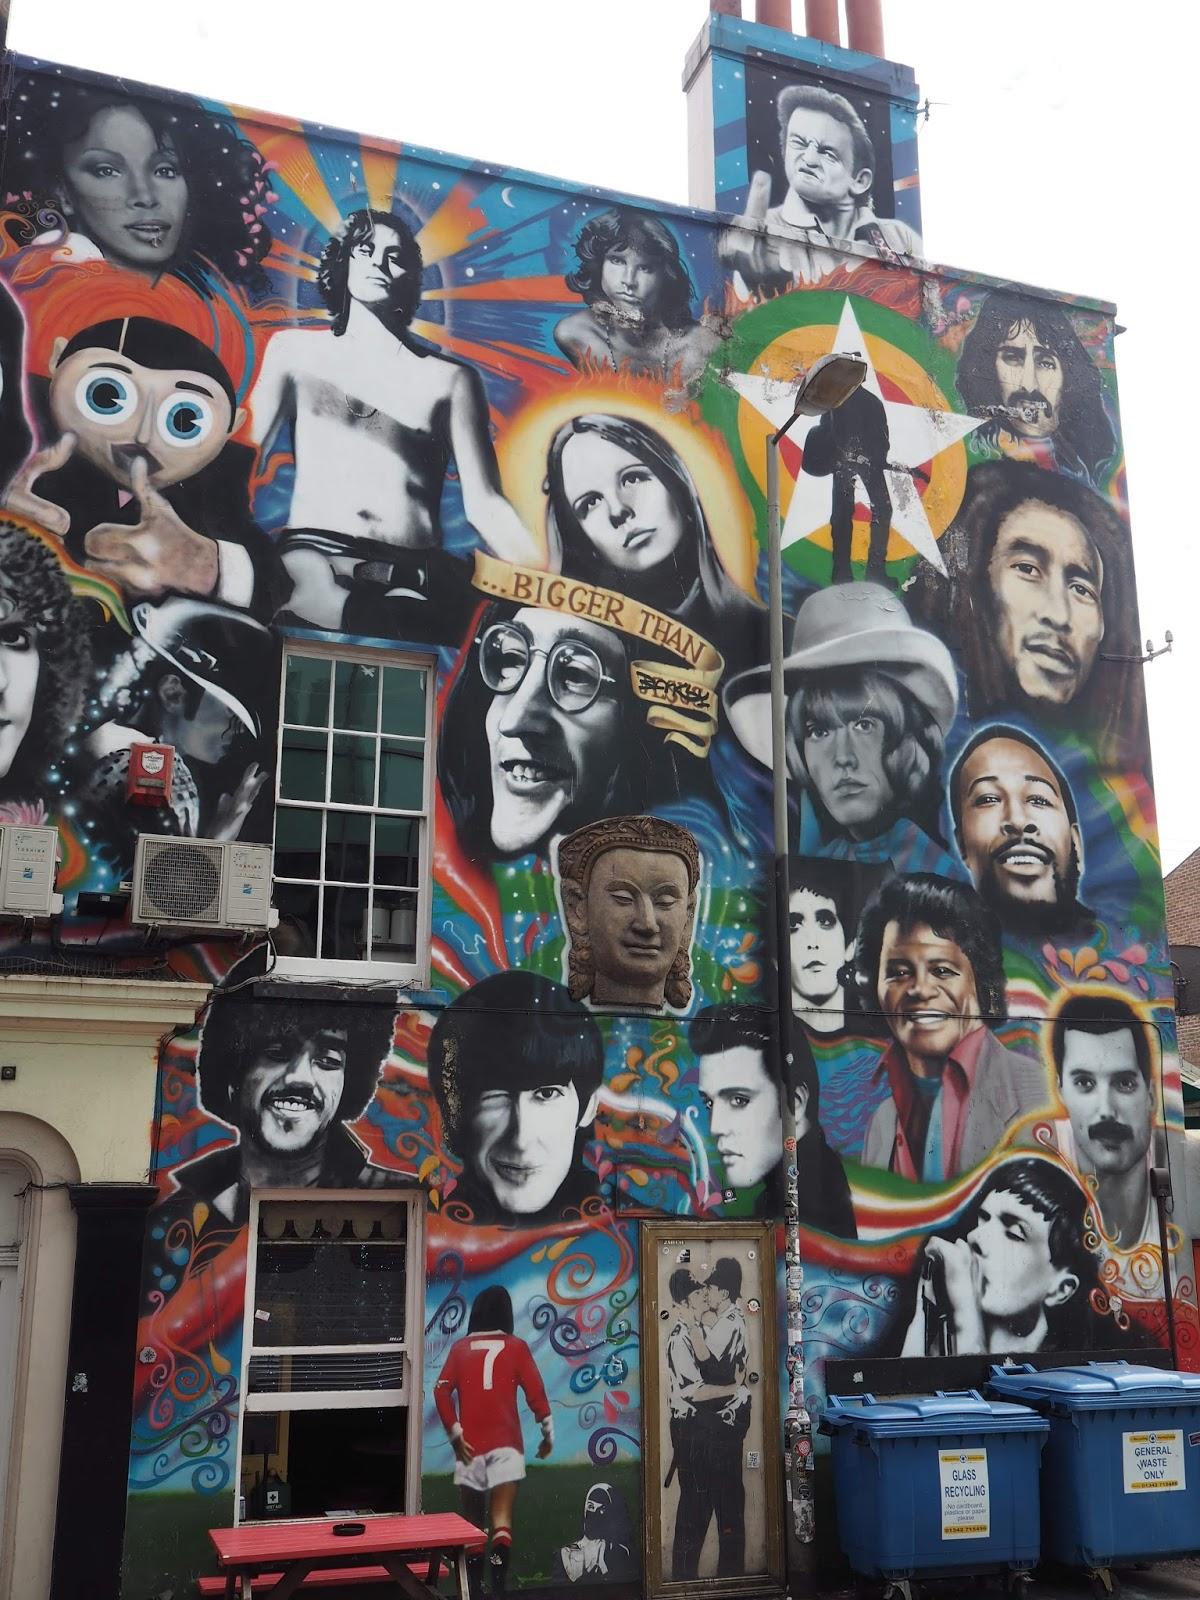 Banksy and other graffiti, Brighton